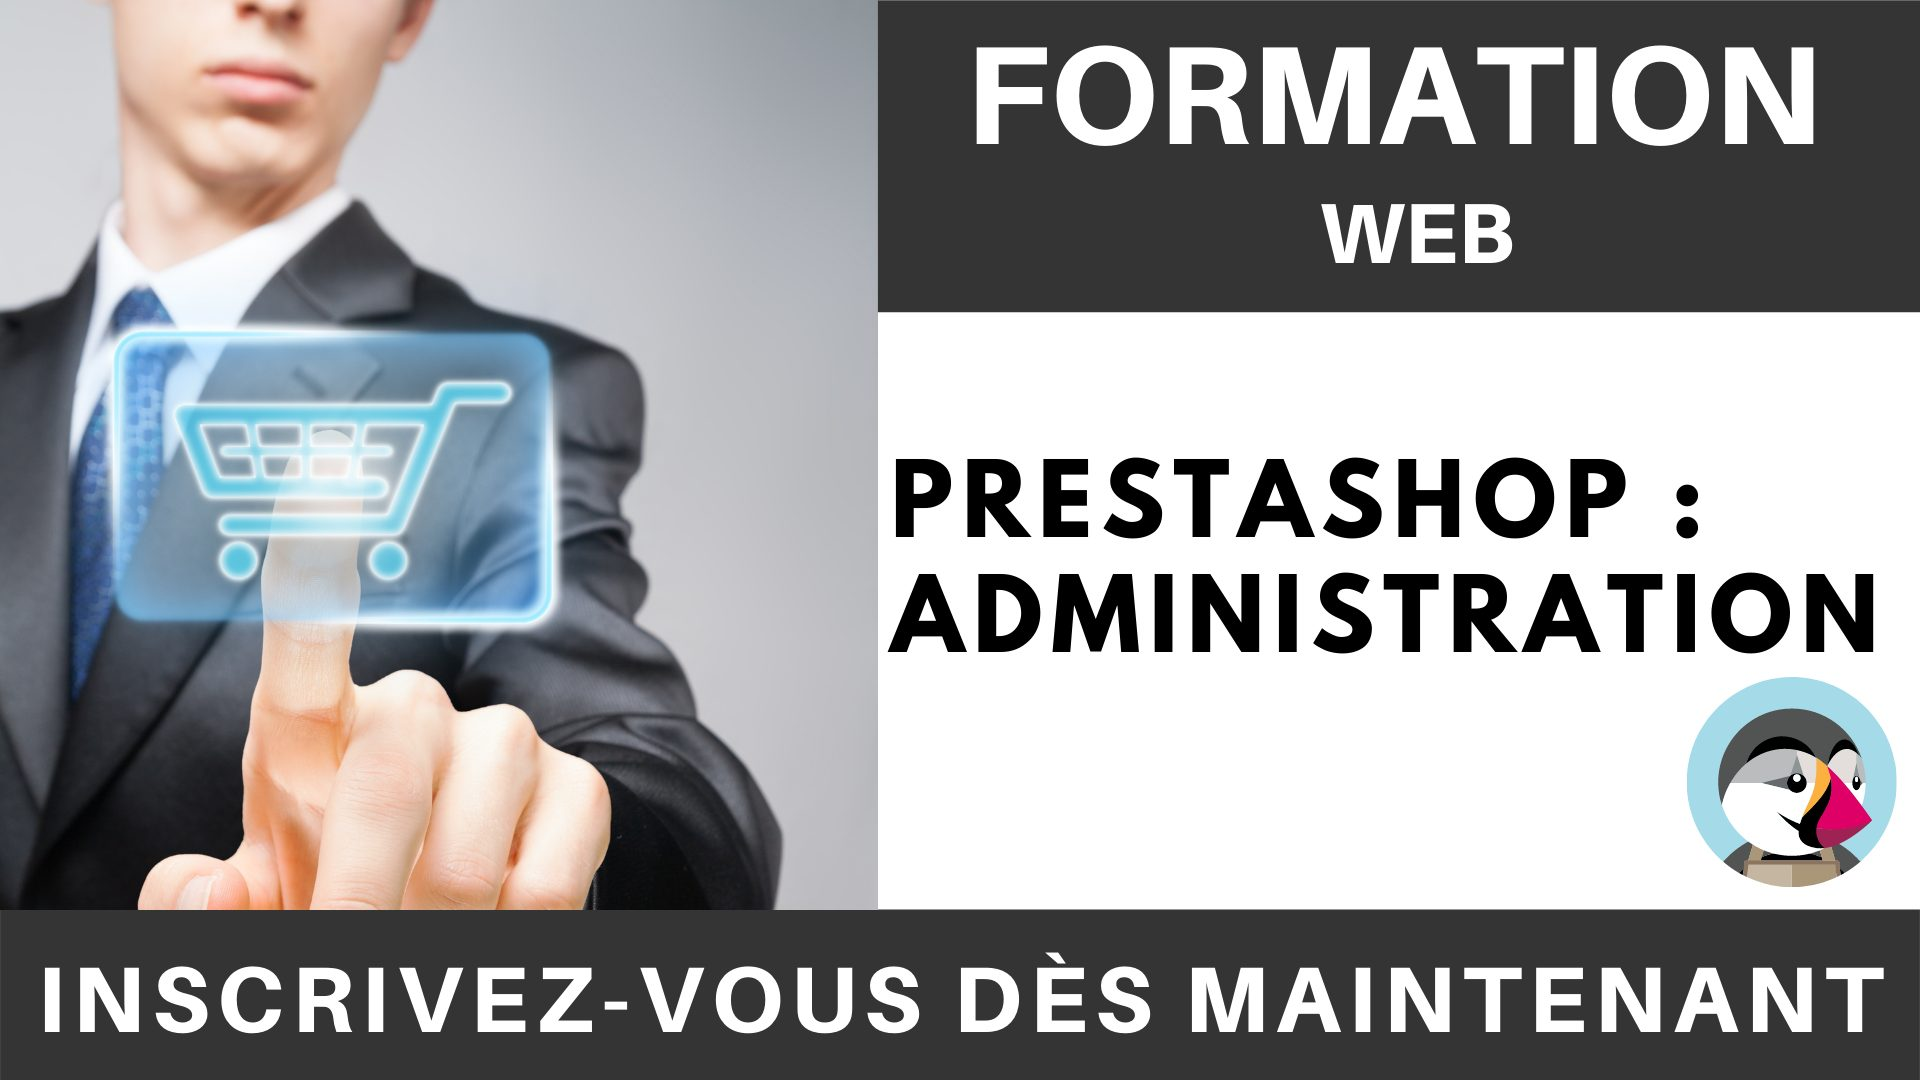 Formation WEB - Prestashop administration (2)